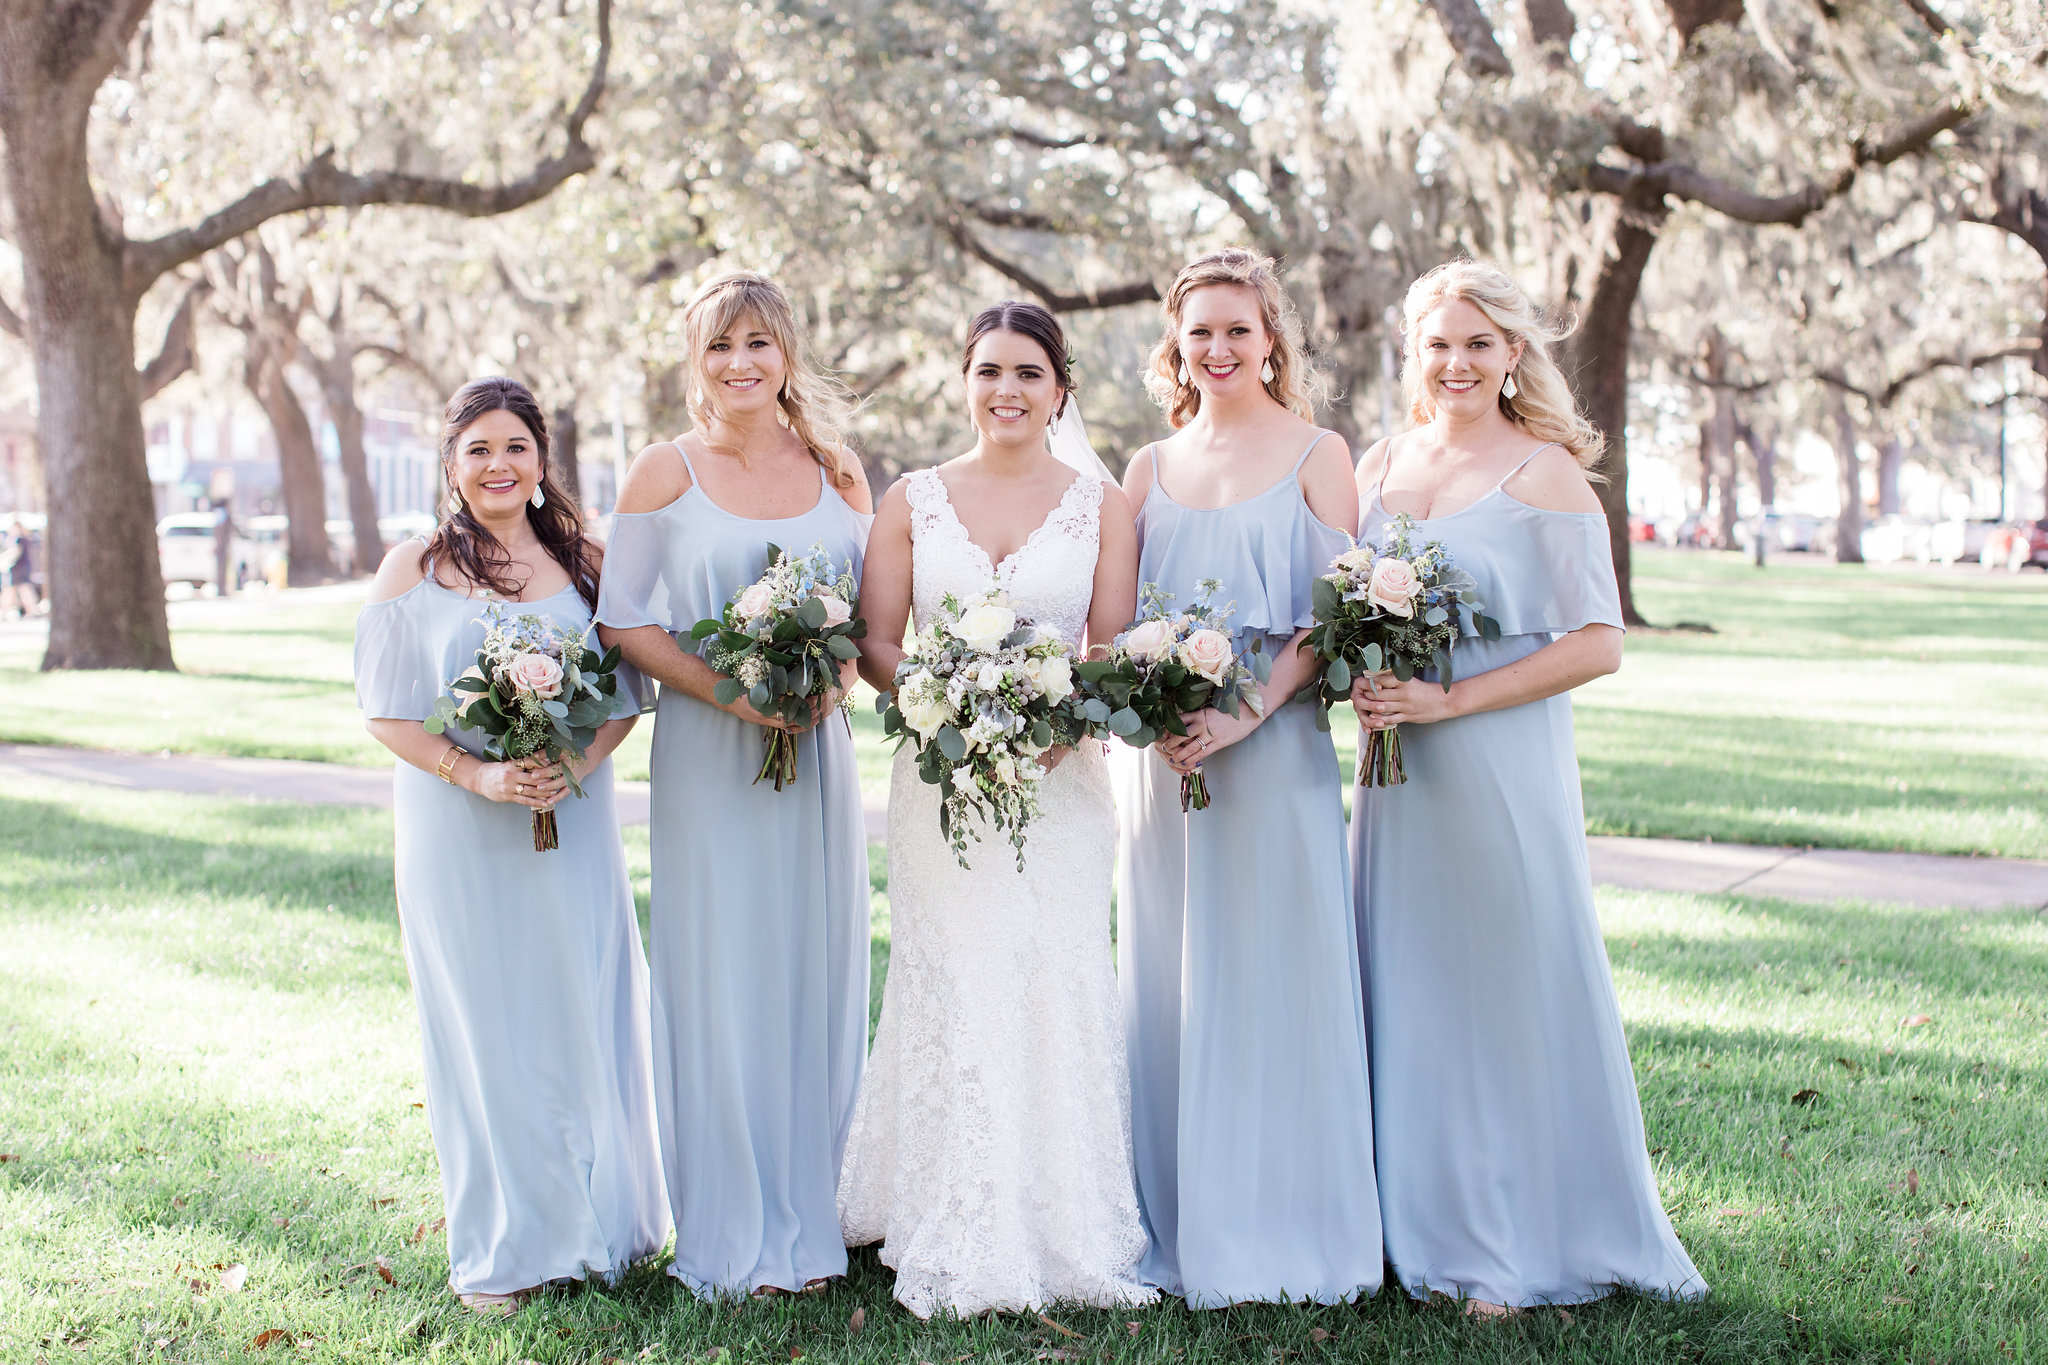 apt-b-photography-Savannah-wedding-photographer-savannah-engagement-photographer-historic-savannah-engagement-charles-h-morris-center-wedding-savannah-weddings-260.JPG